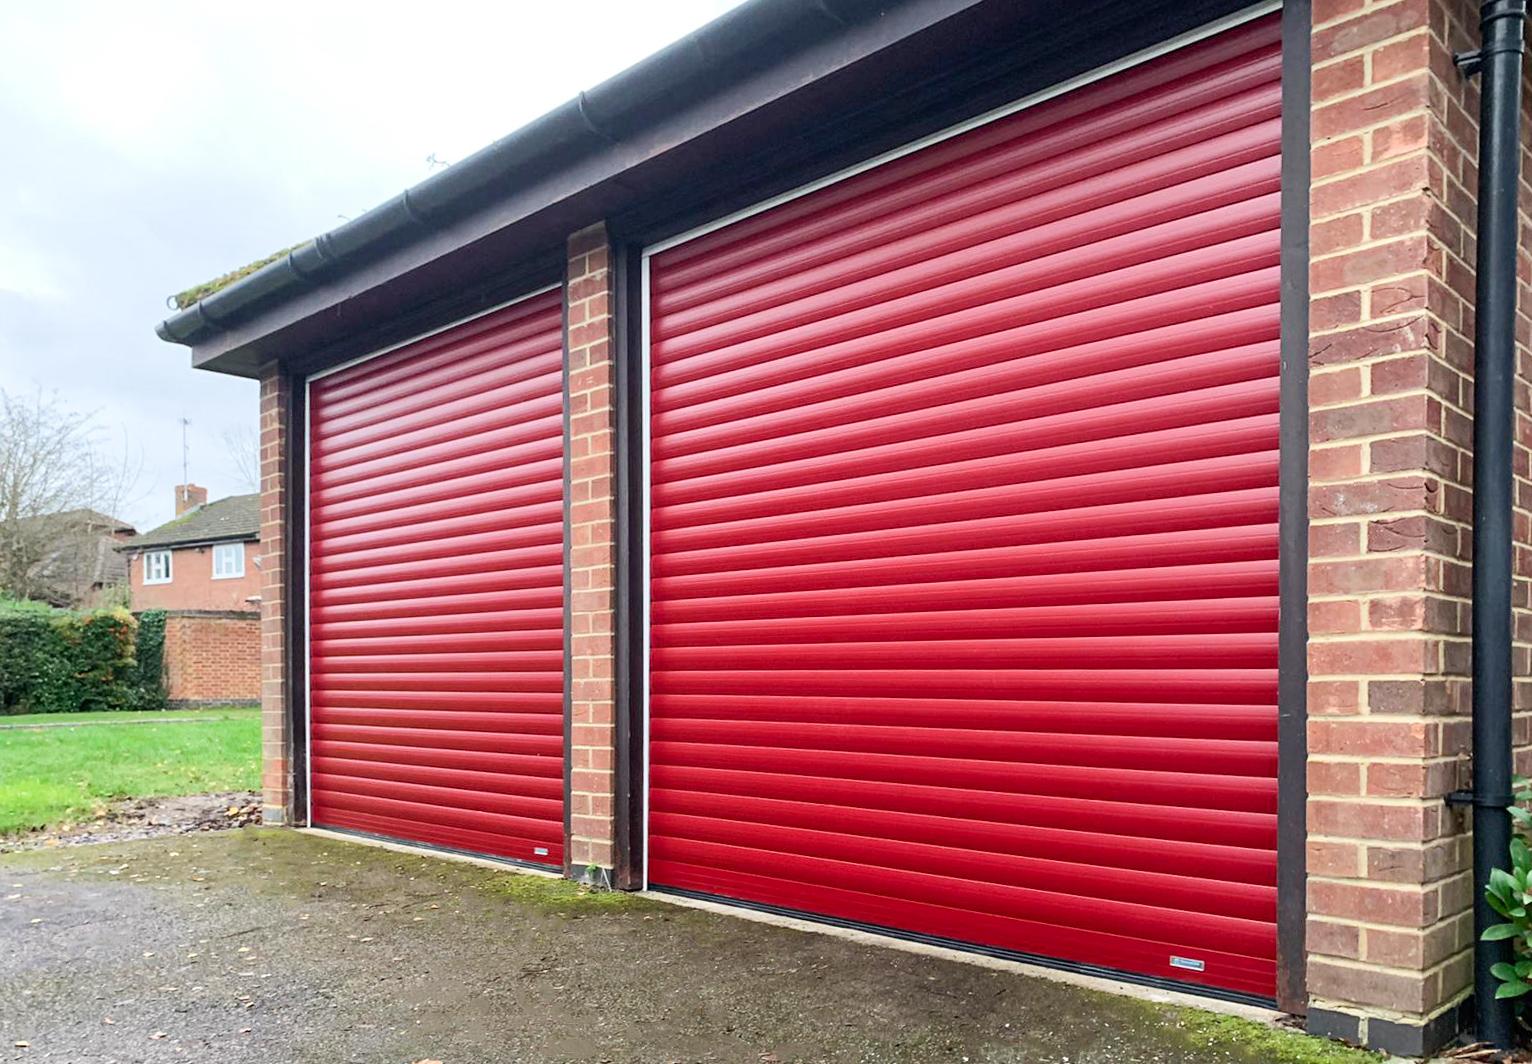 SeceuroGlide LT Roller Garage Door Finished in Red